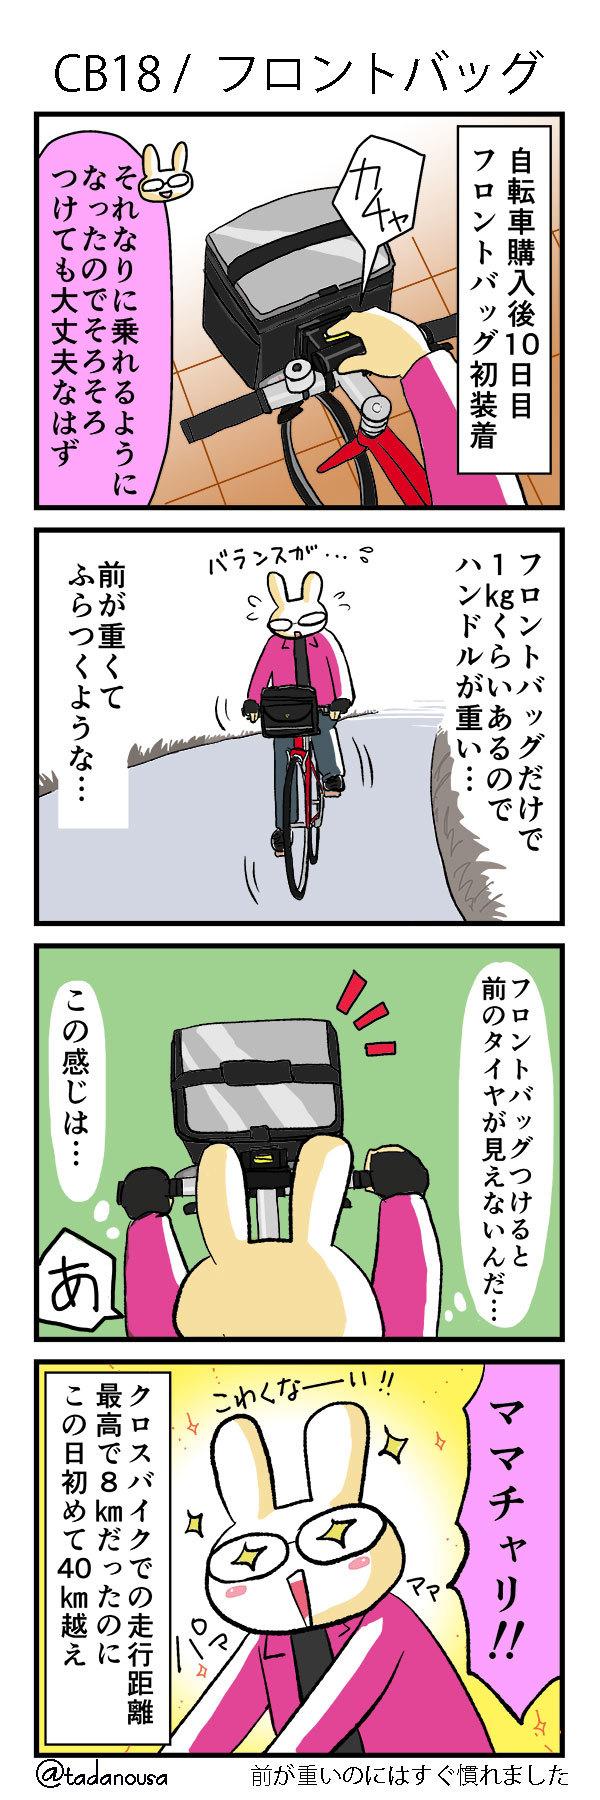 bike_4koma_kako058_2_s.jpg